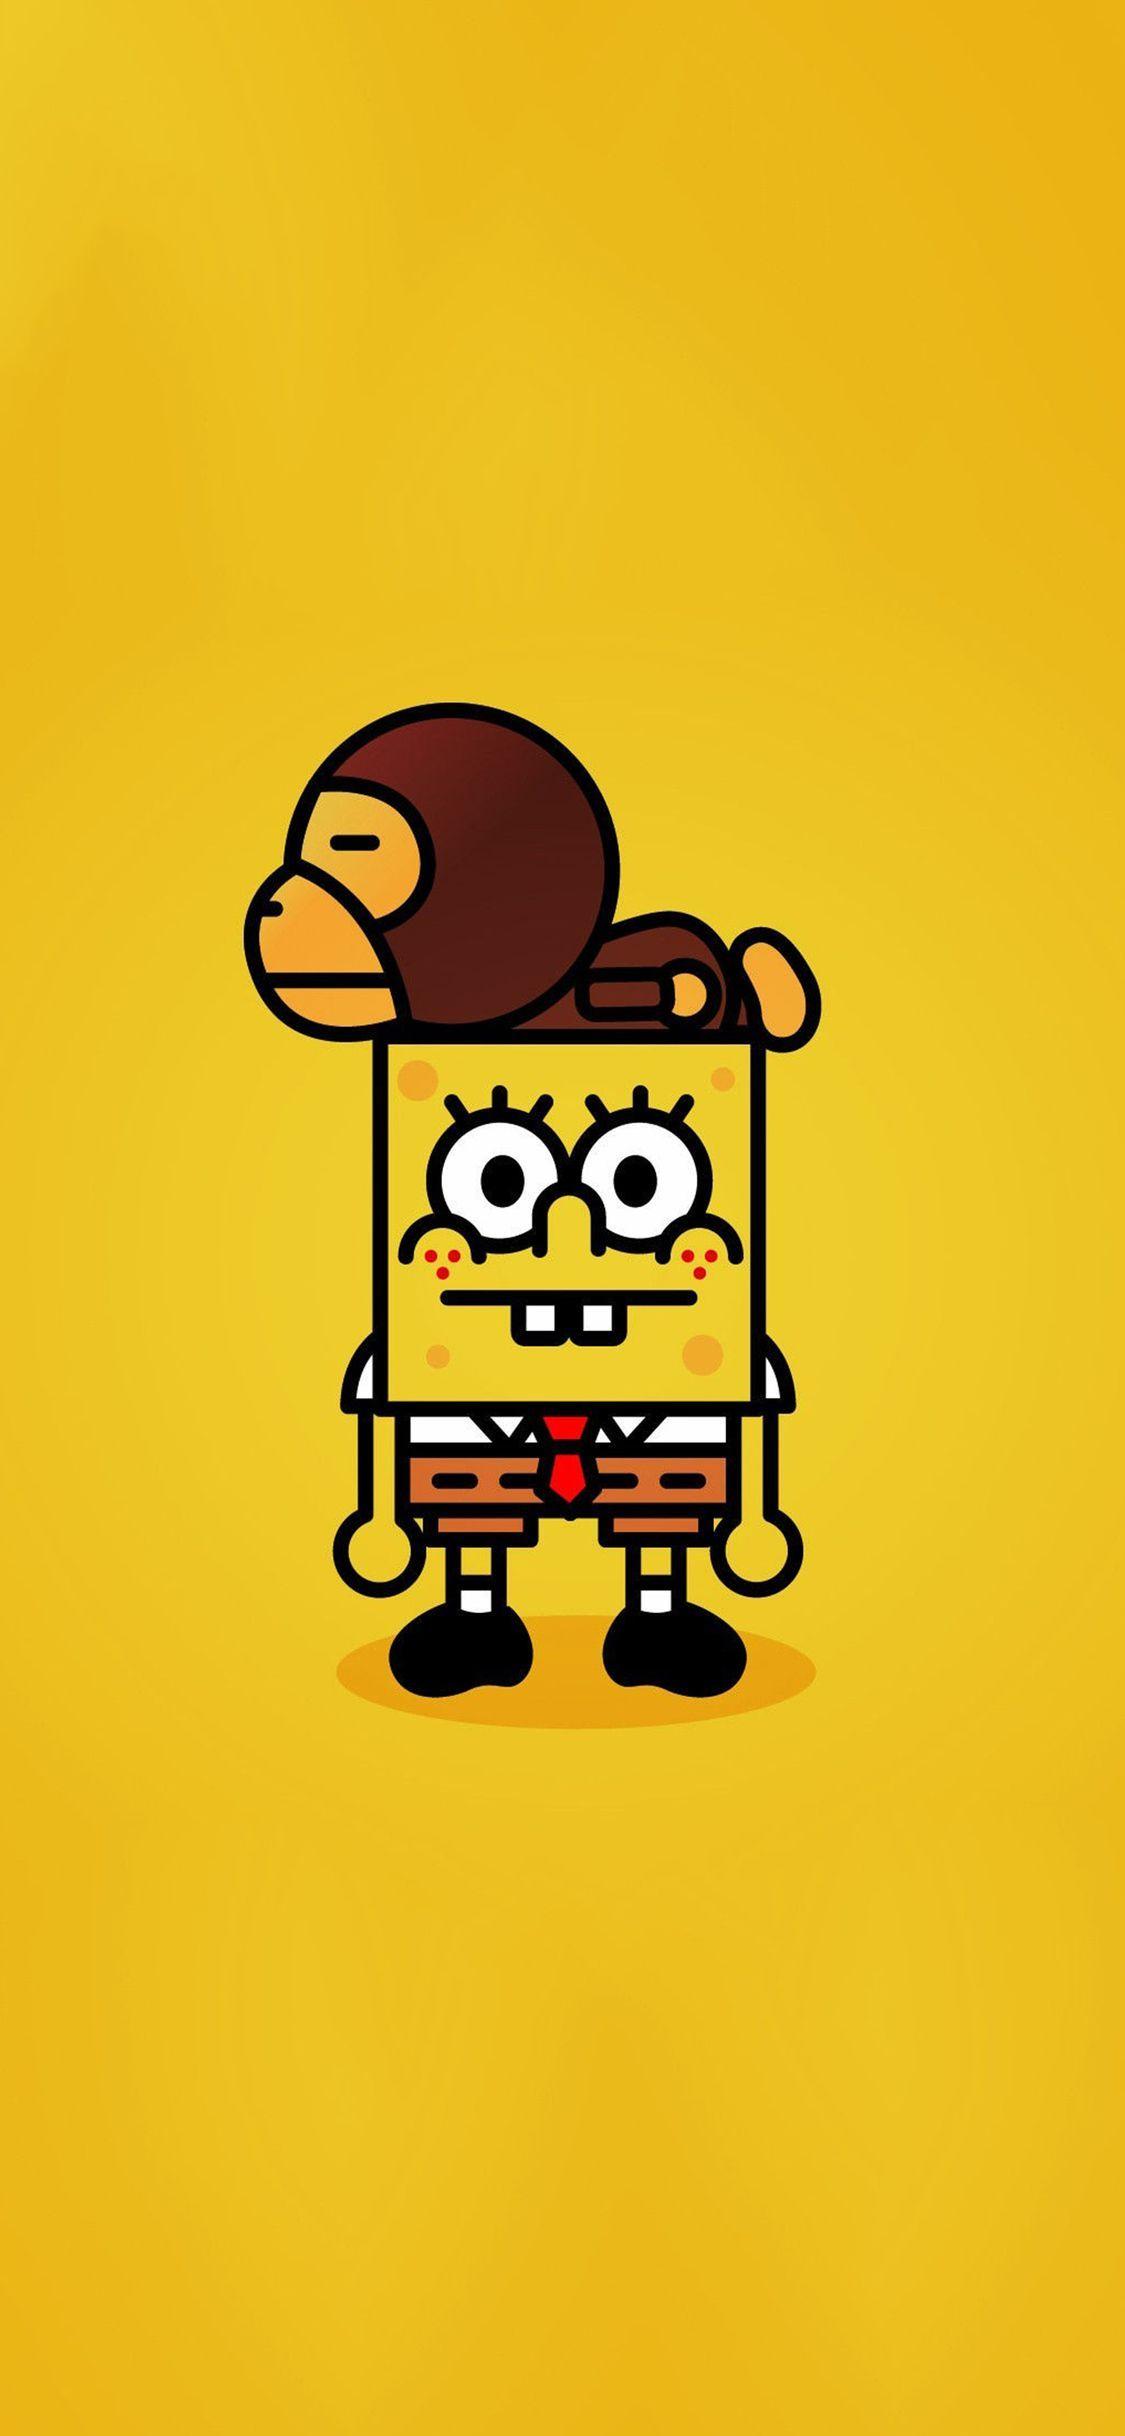 Spongebob Squarepants Spongebob Wallpaper Cartoon Wallpaper Cartoon Wallpaper Iphone